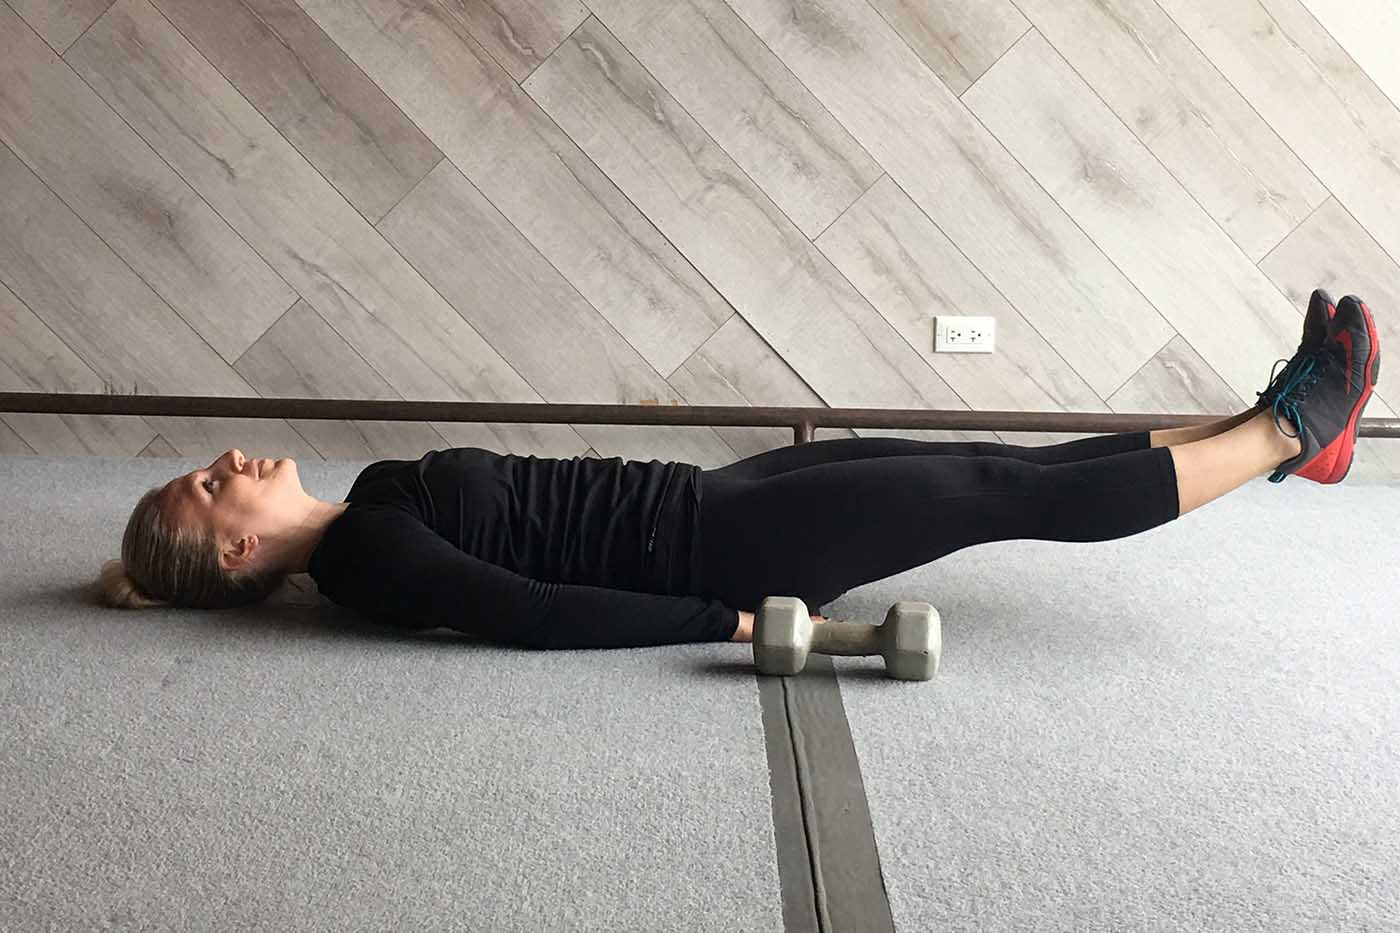 asweatlife_sweatlife_30-minute-workout_1